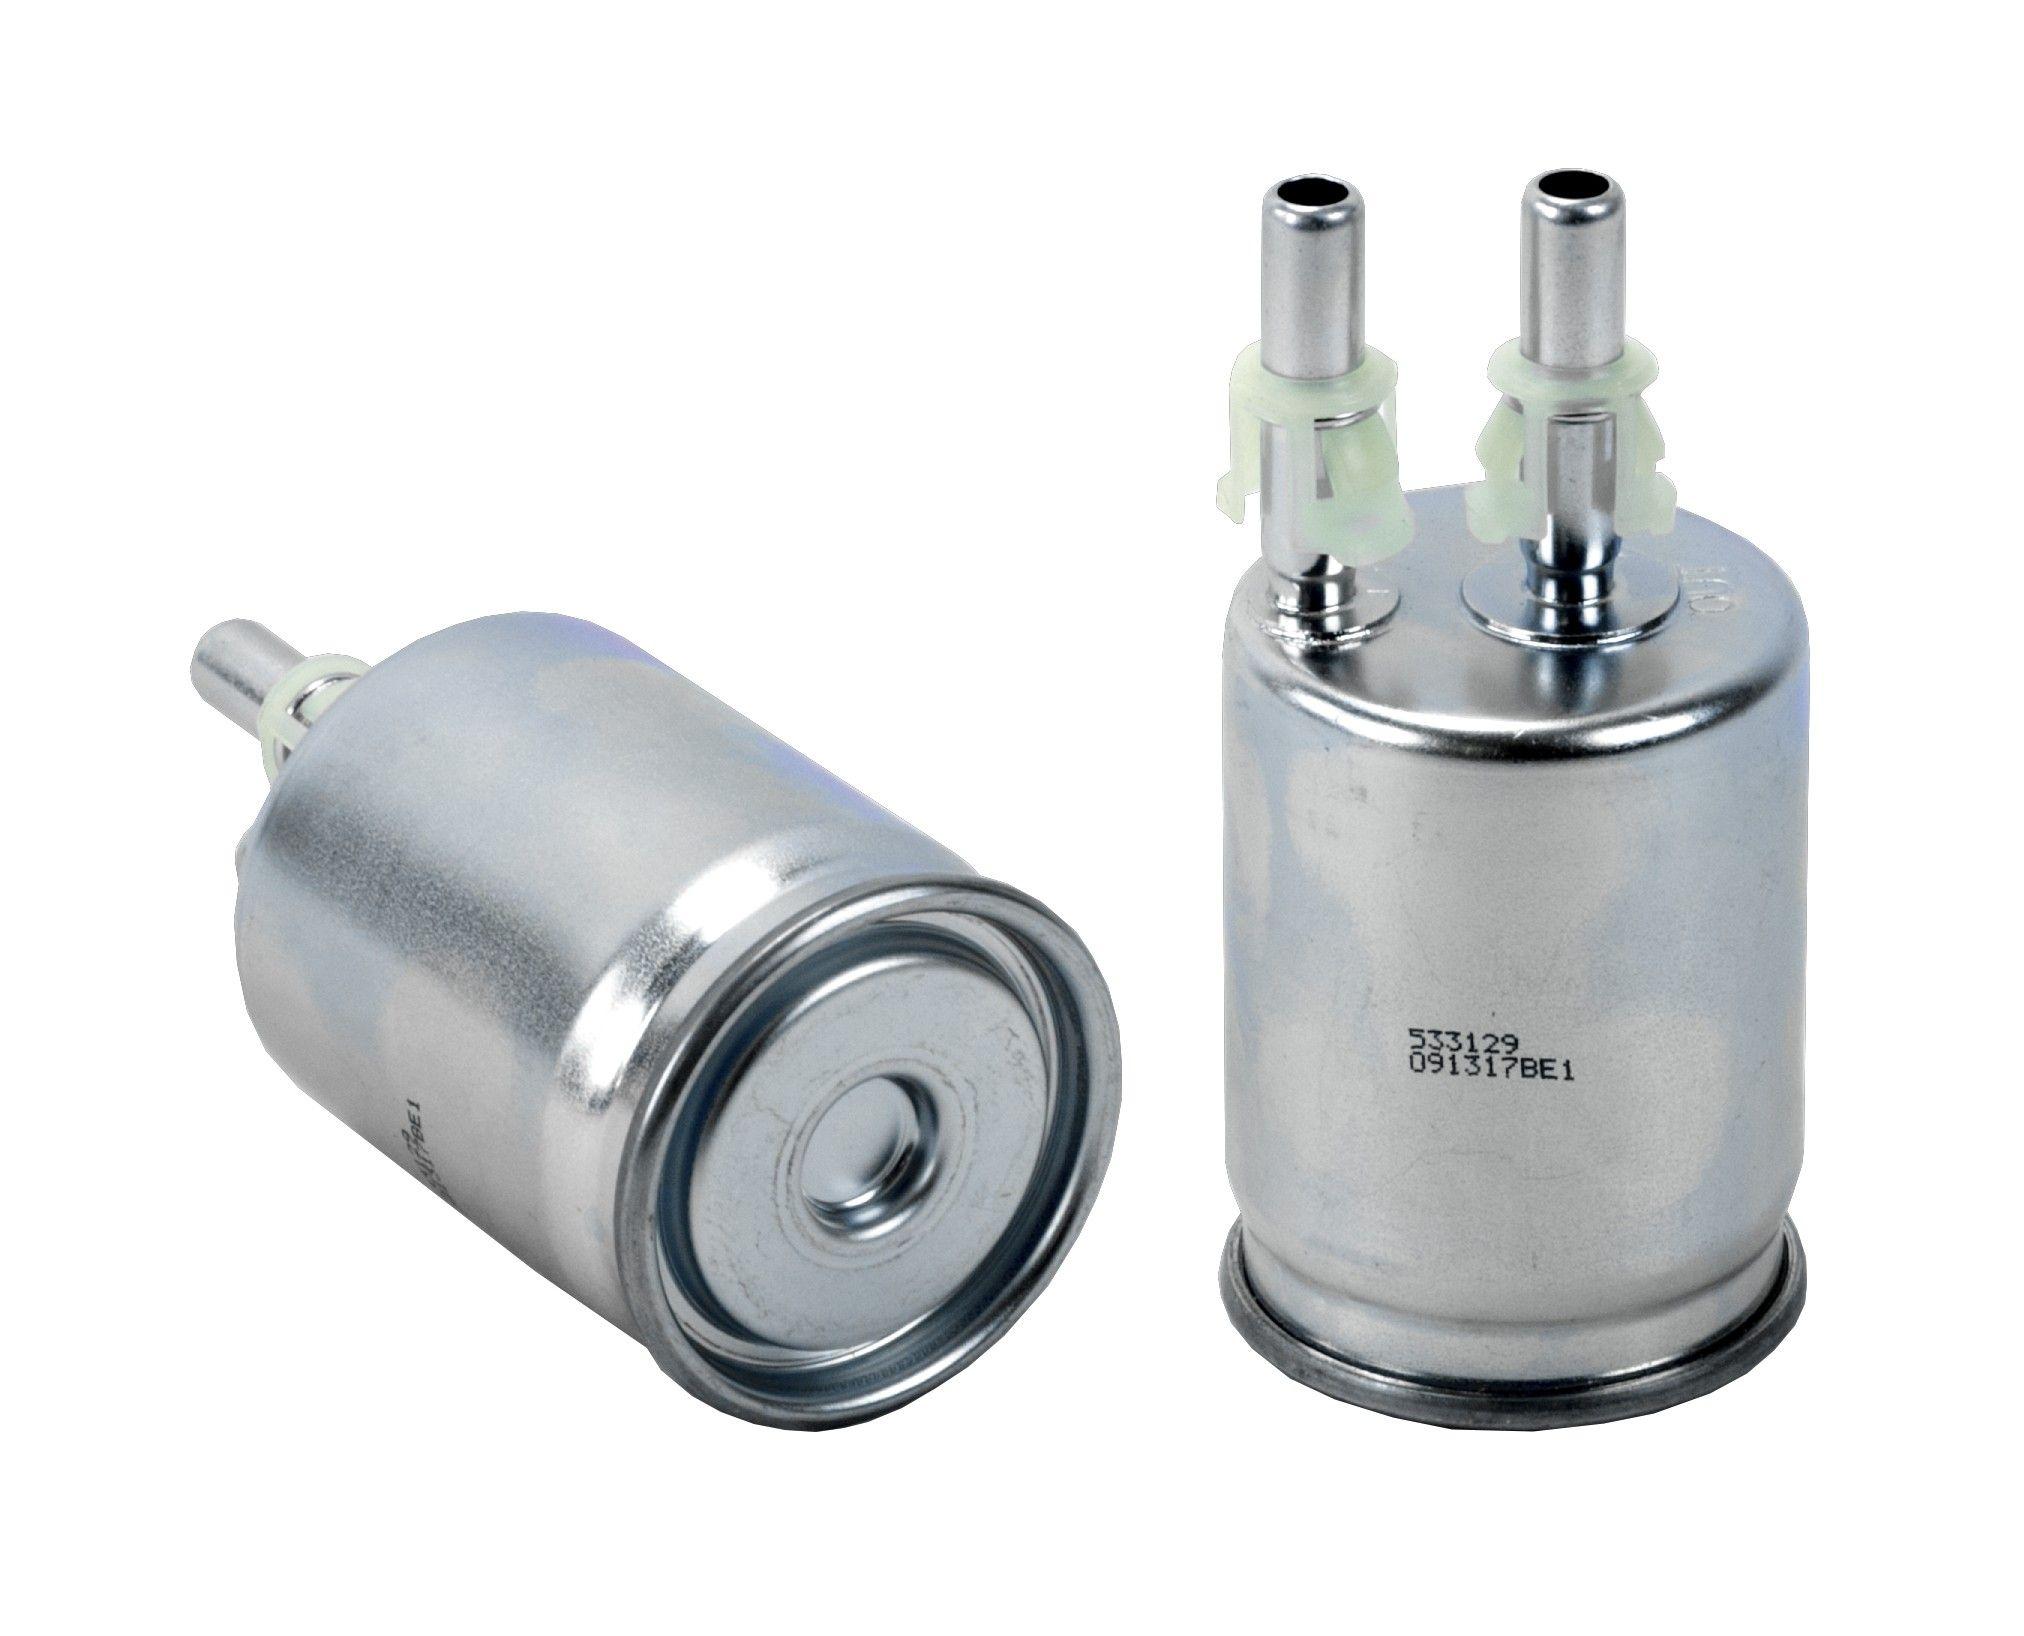 2004 Hummer H2 Fuel Filter 8 Cyl 6.0L (Wix 33129)